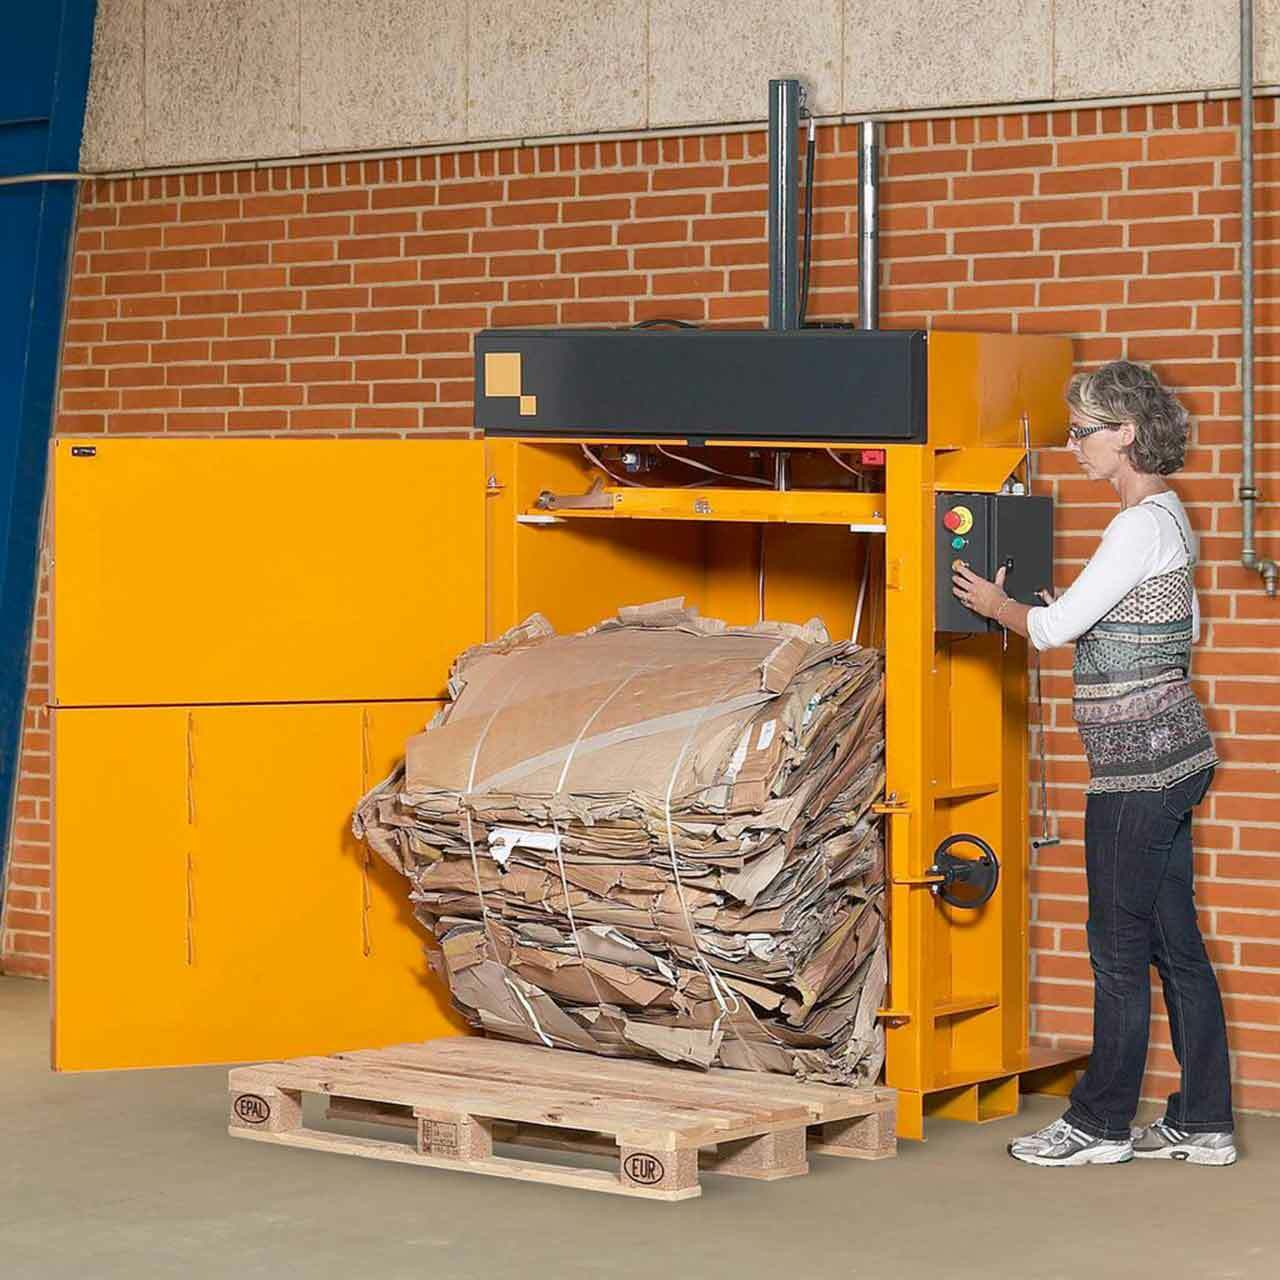 Removing cardboard bale